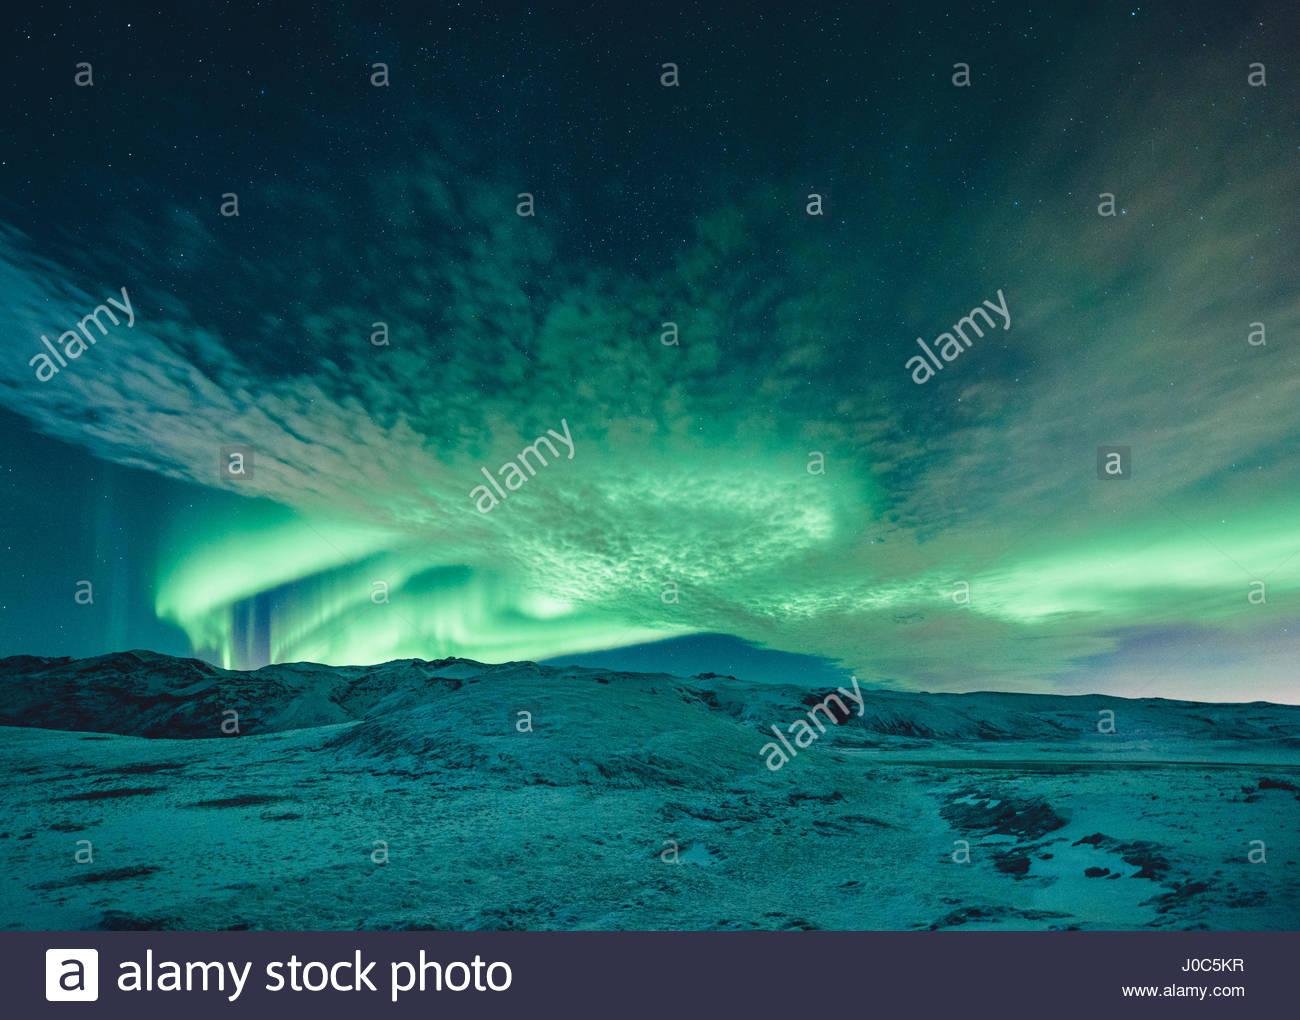 Aurora borealis swirling green over snow covered landscape, Lake Kleifarvatn, Iceland - Stock Image